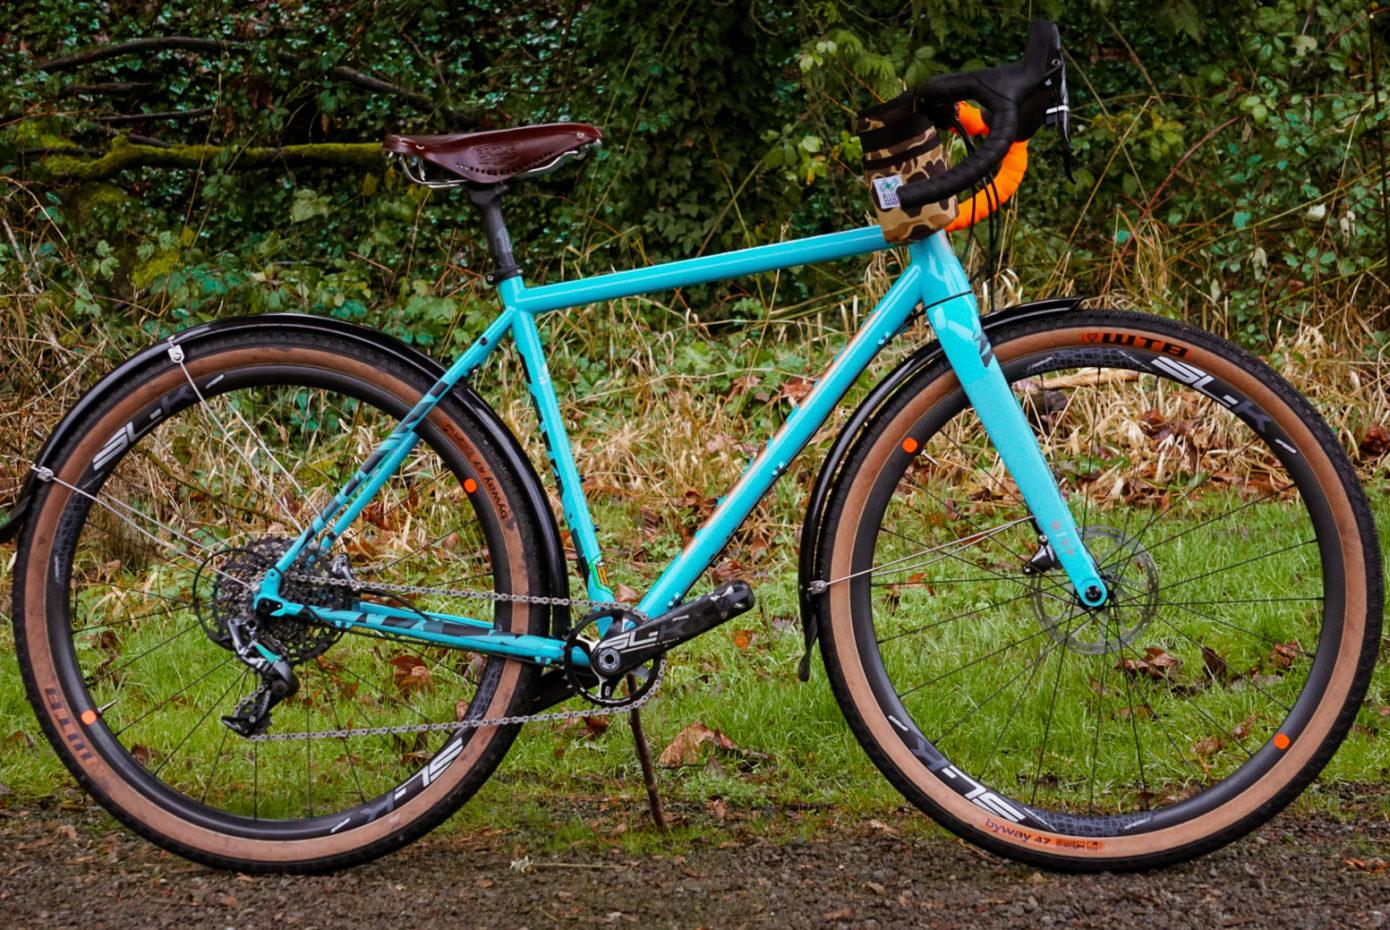 e418b657dce Kona Dream Builds: The Bearded Bike Packer's Fully Loaded Rove LTD